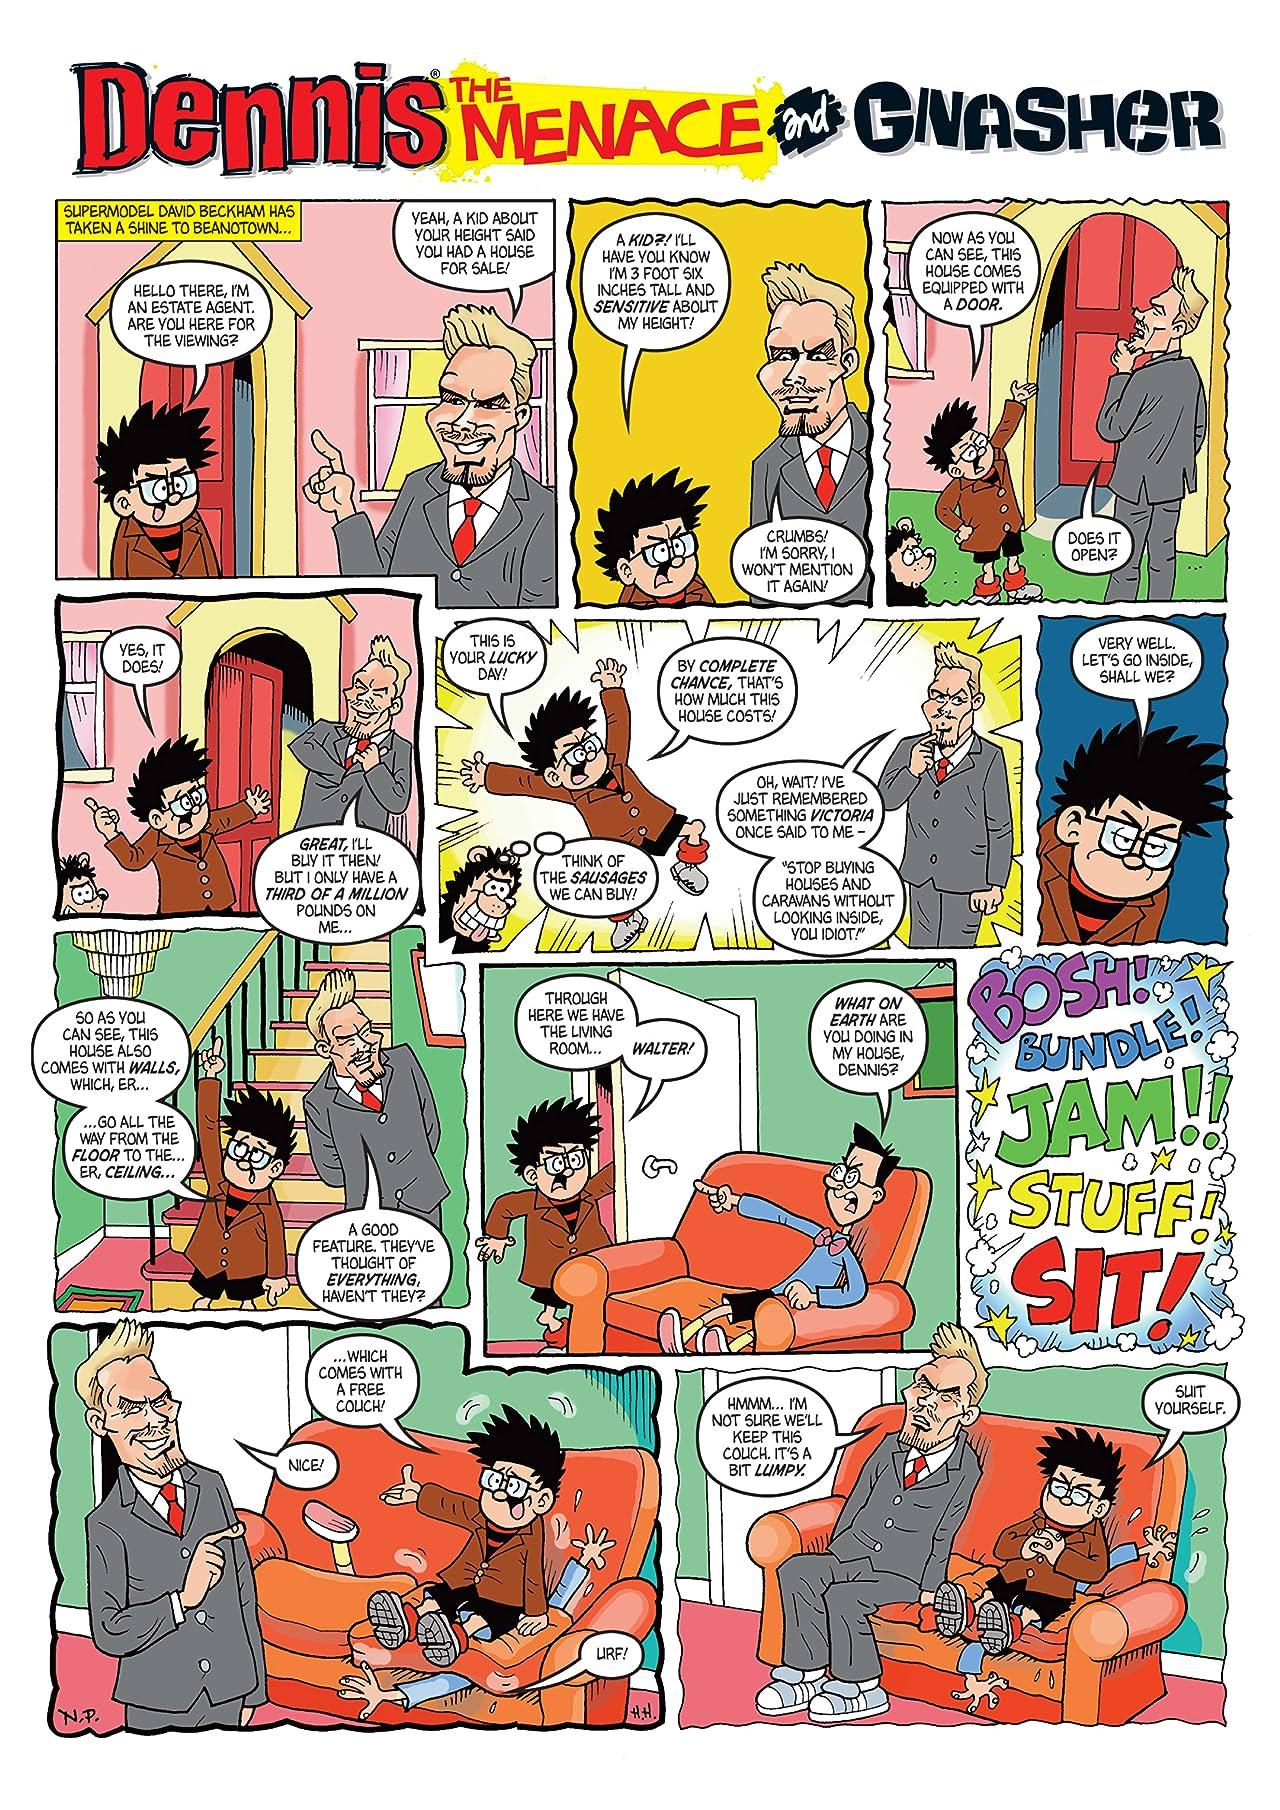 The Beano presents Dennis the Menace and Gnasher #8: Menacing Mayhem